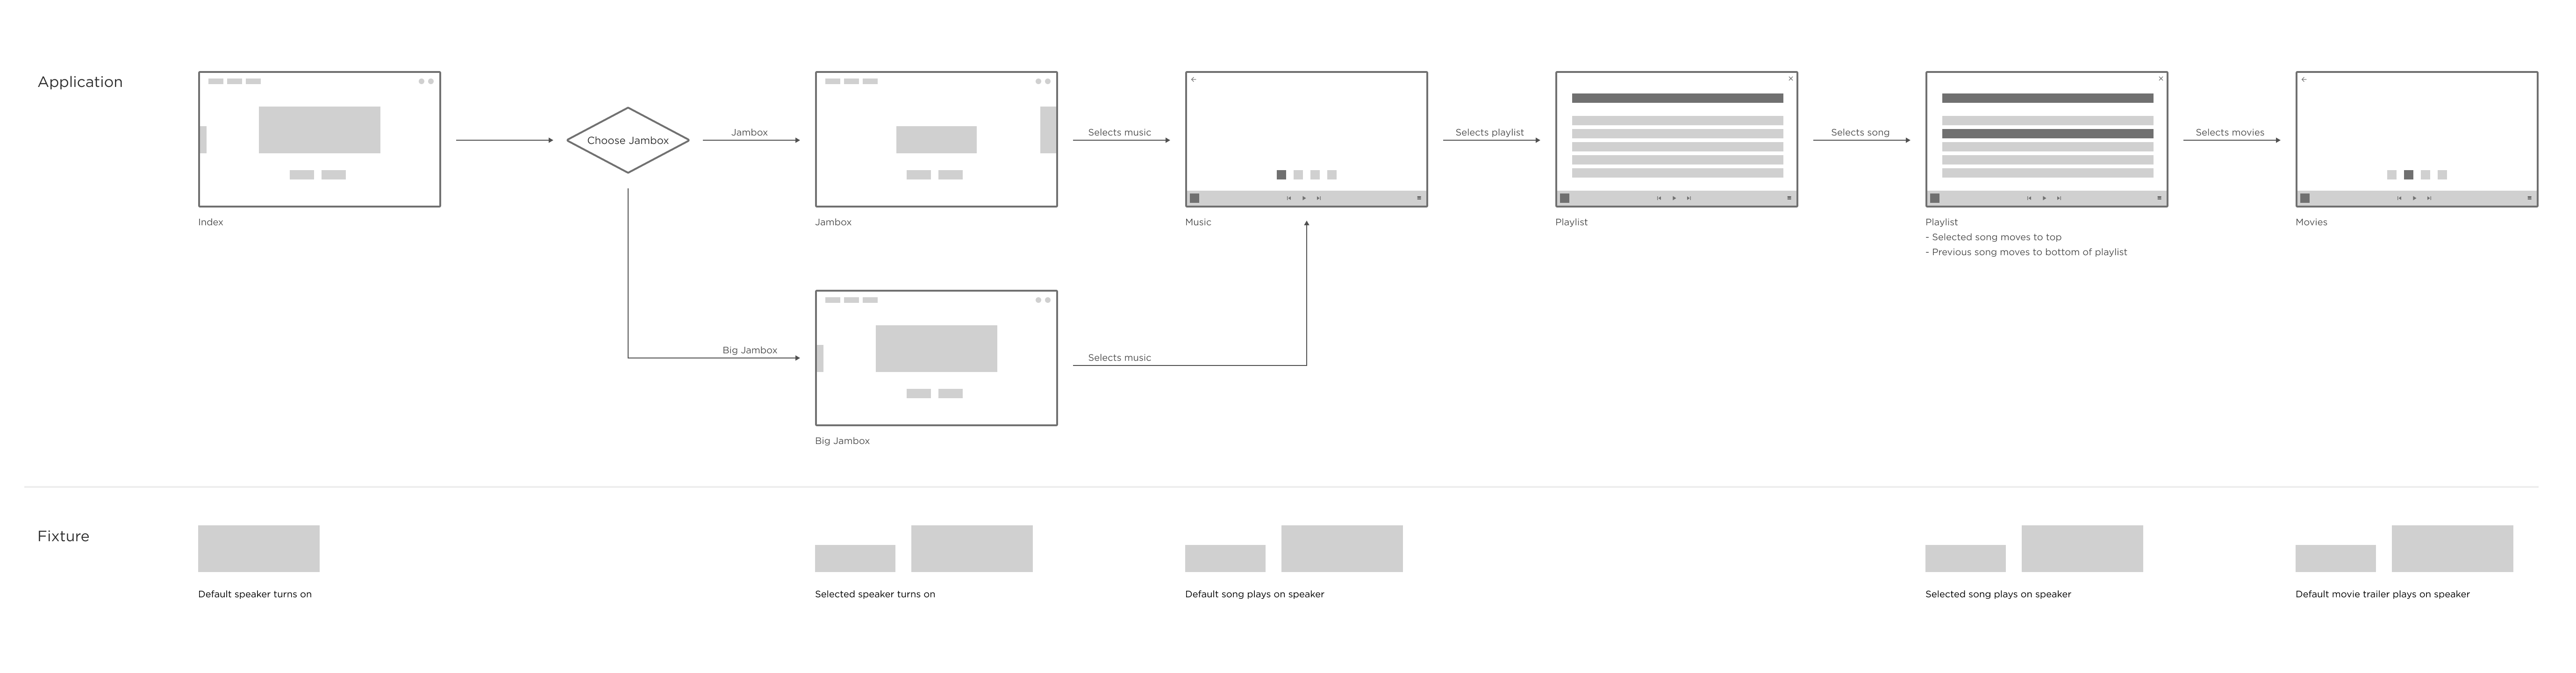 Key screen flow - Play